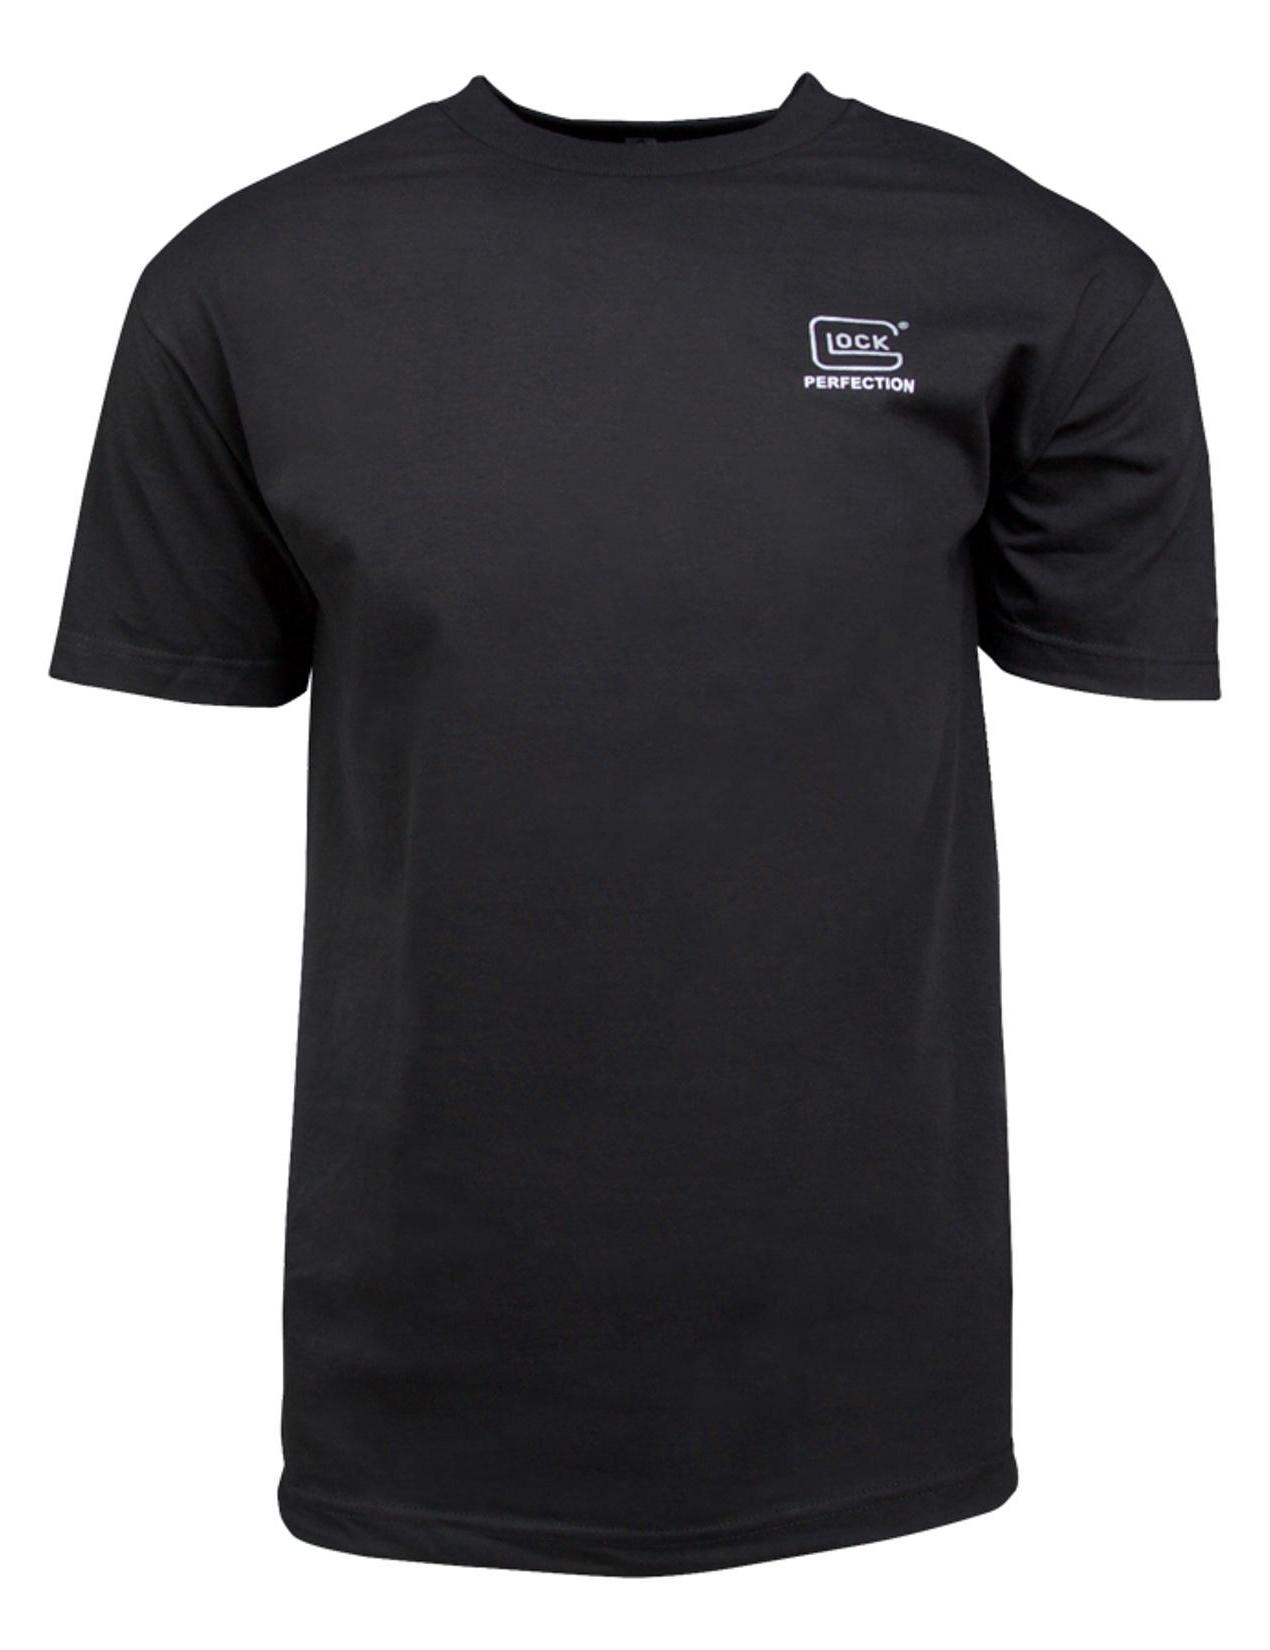 Glock Perfection Short Sleeve T-Shirt